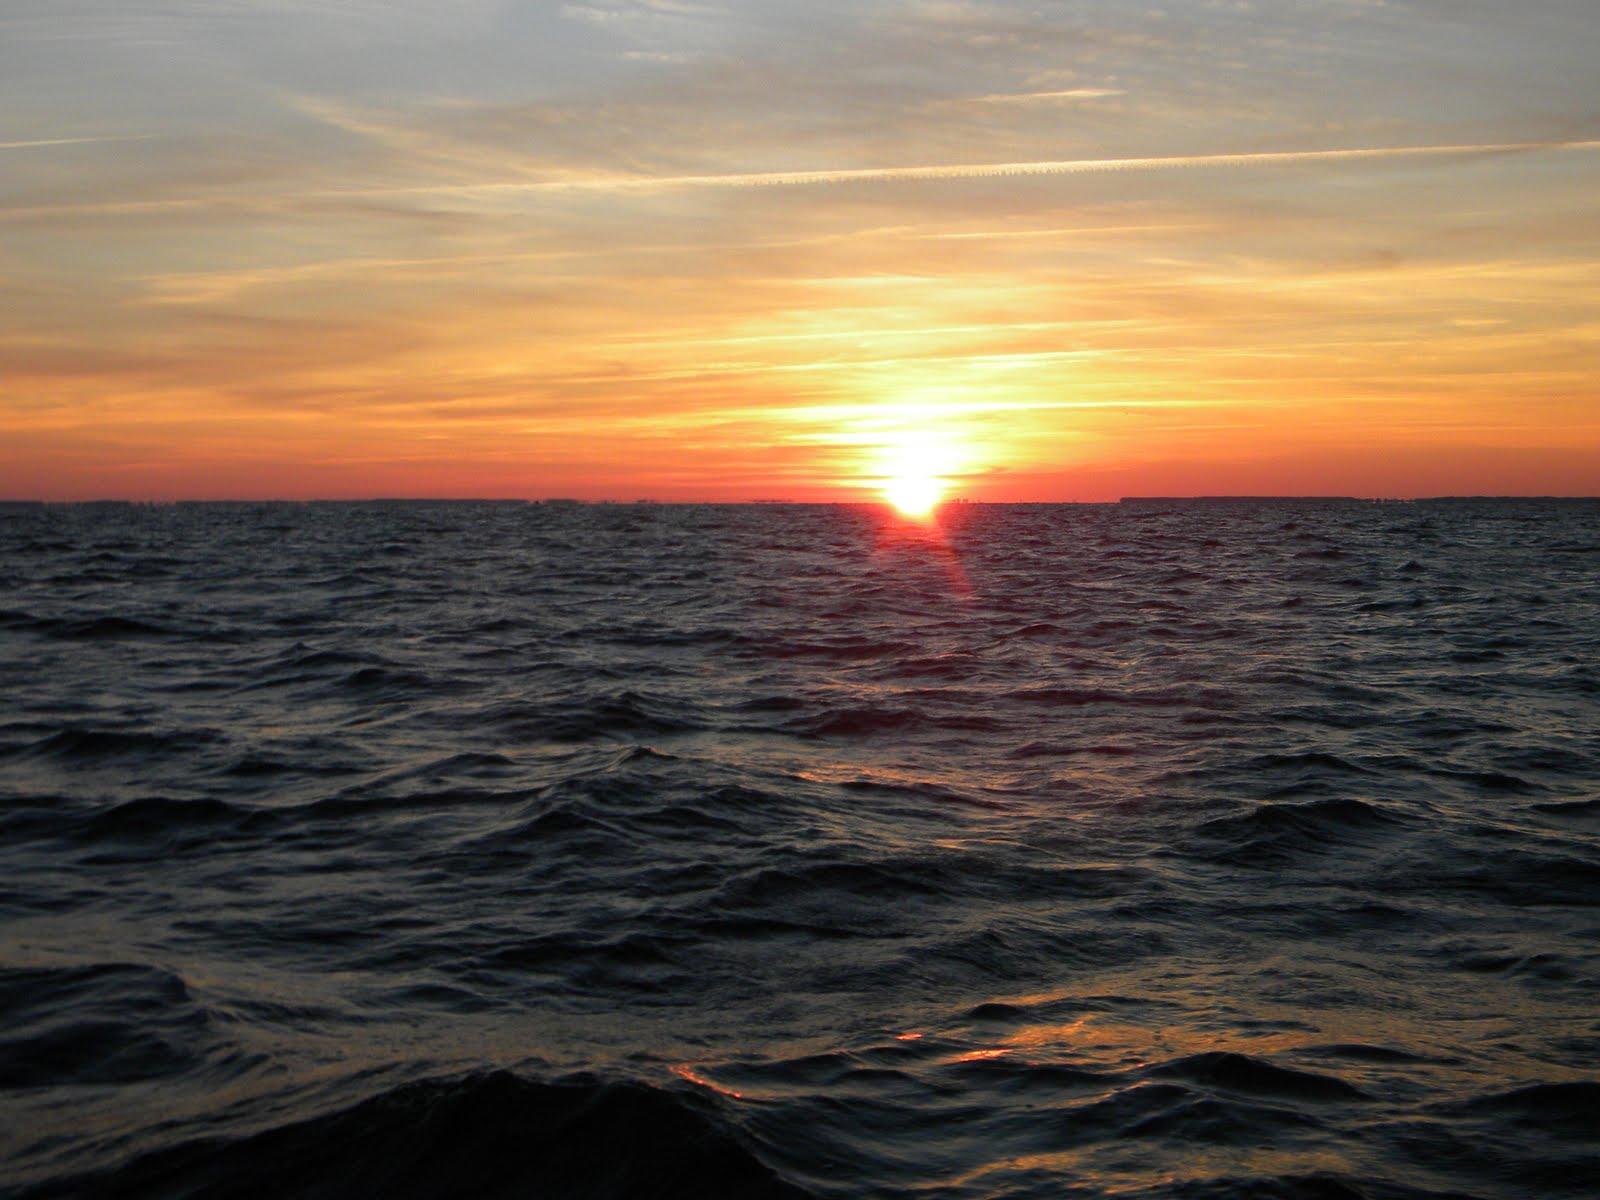 Tourist first maryland chesapeake bay fishing for Fishing chesapeake bay